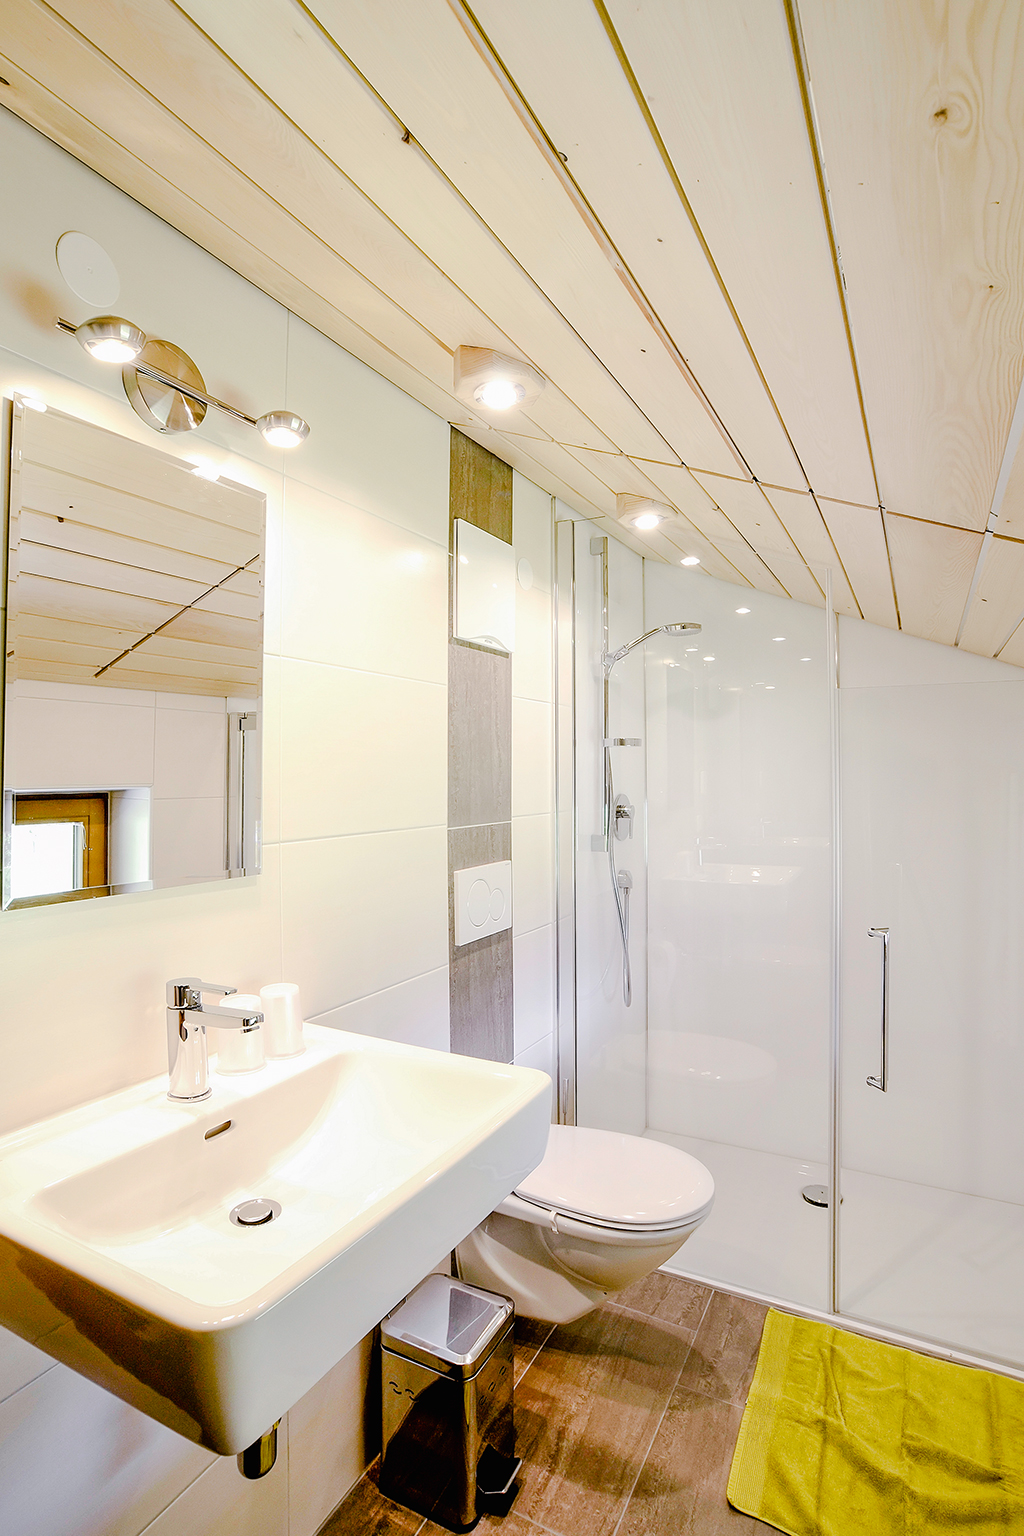 Appartement de vacances 8-11 Pers. (431503), Uderns, Zillertal, Tyrol, Autriche, image 5